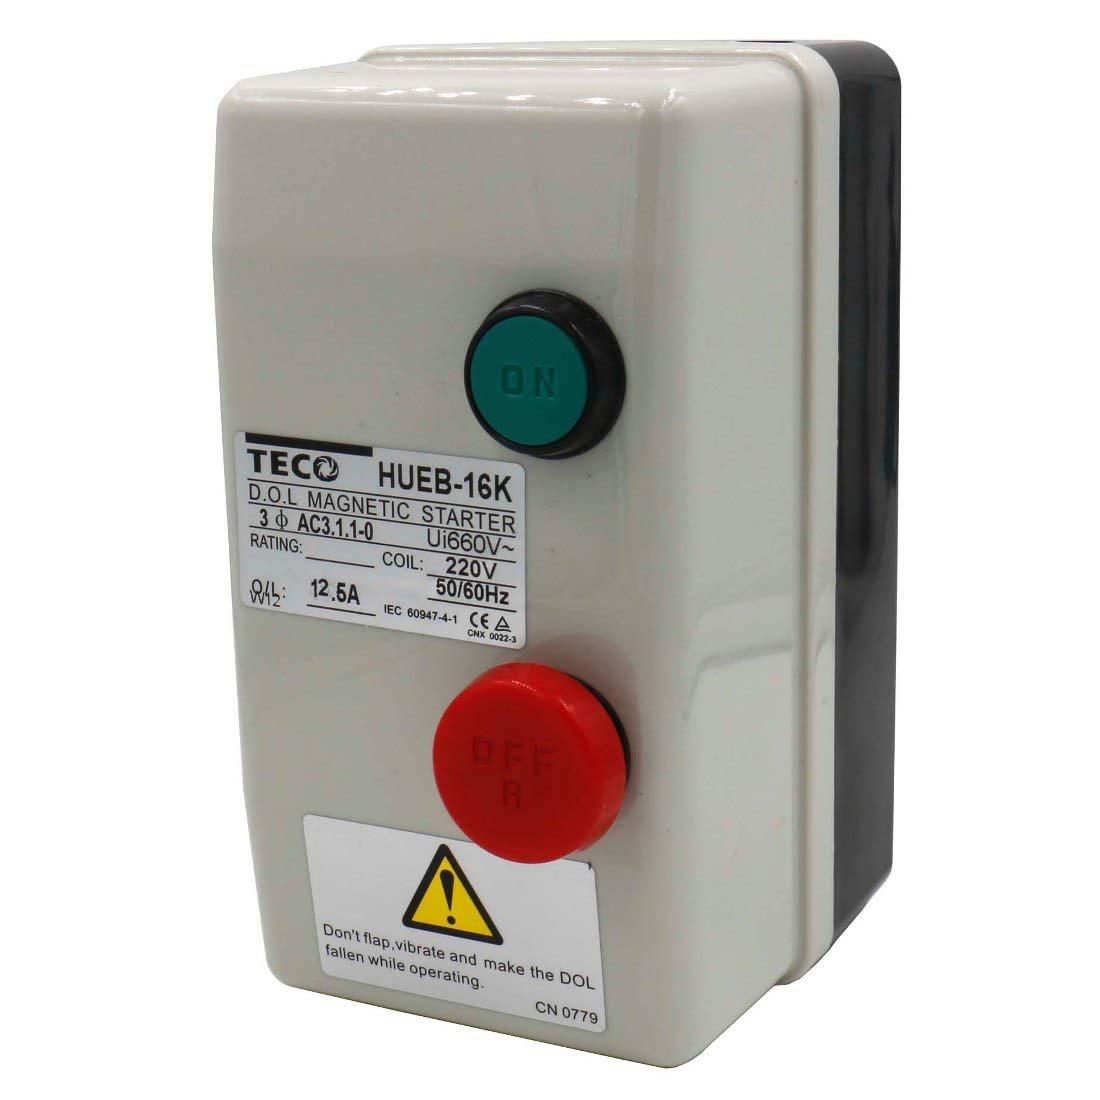 Baomain Magnetic Starter HUEB-16K AC 220V Coil 8.5-12.5A 3-Pole Push Button Control Motor